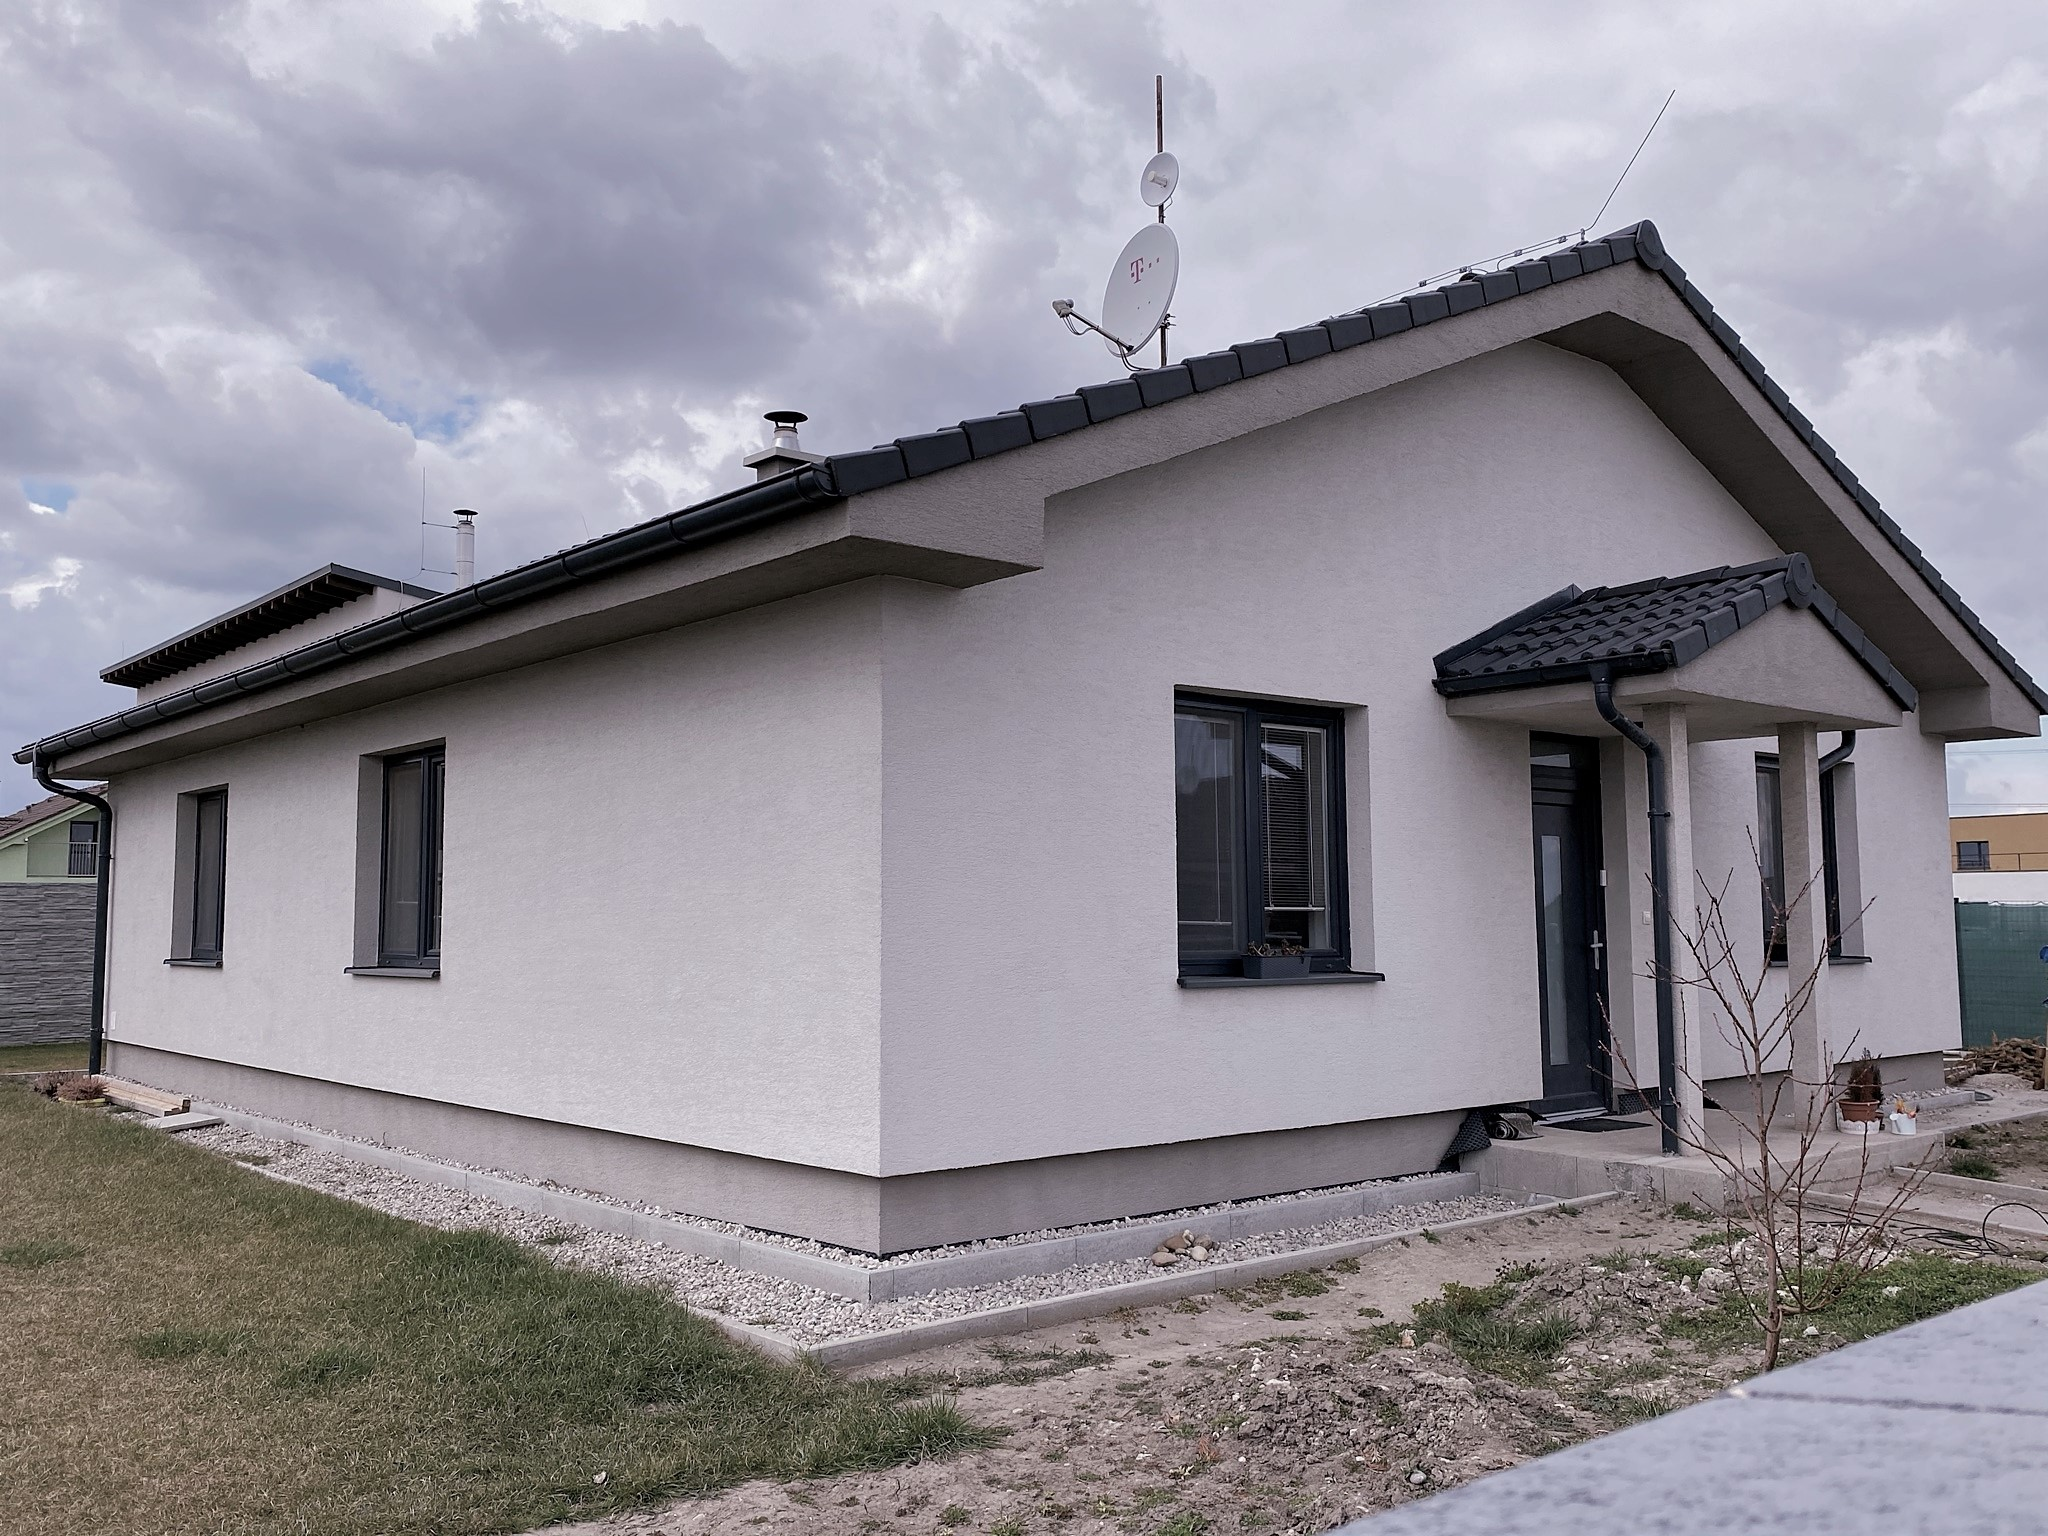 Stavebný inžinier – Bratislava Senec Trnava Pezinok Malacky Dunajská Streda